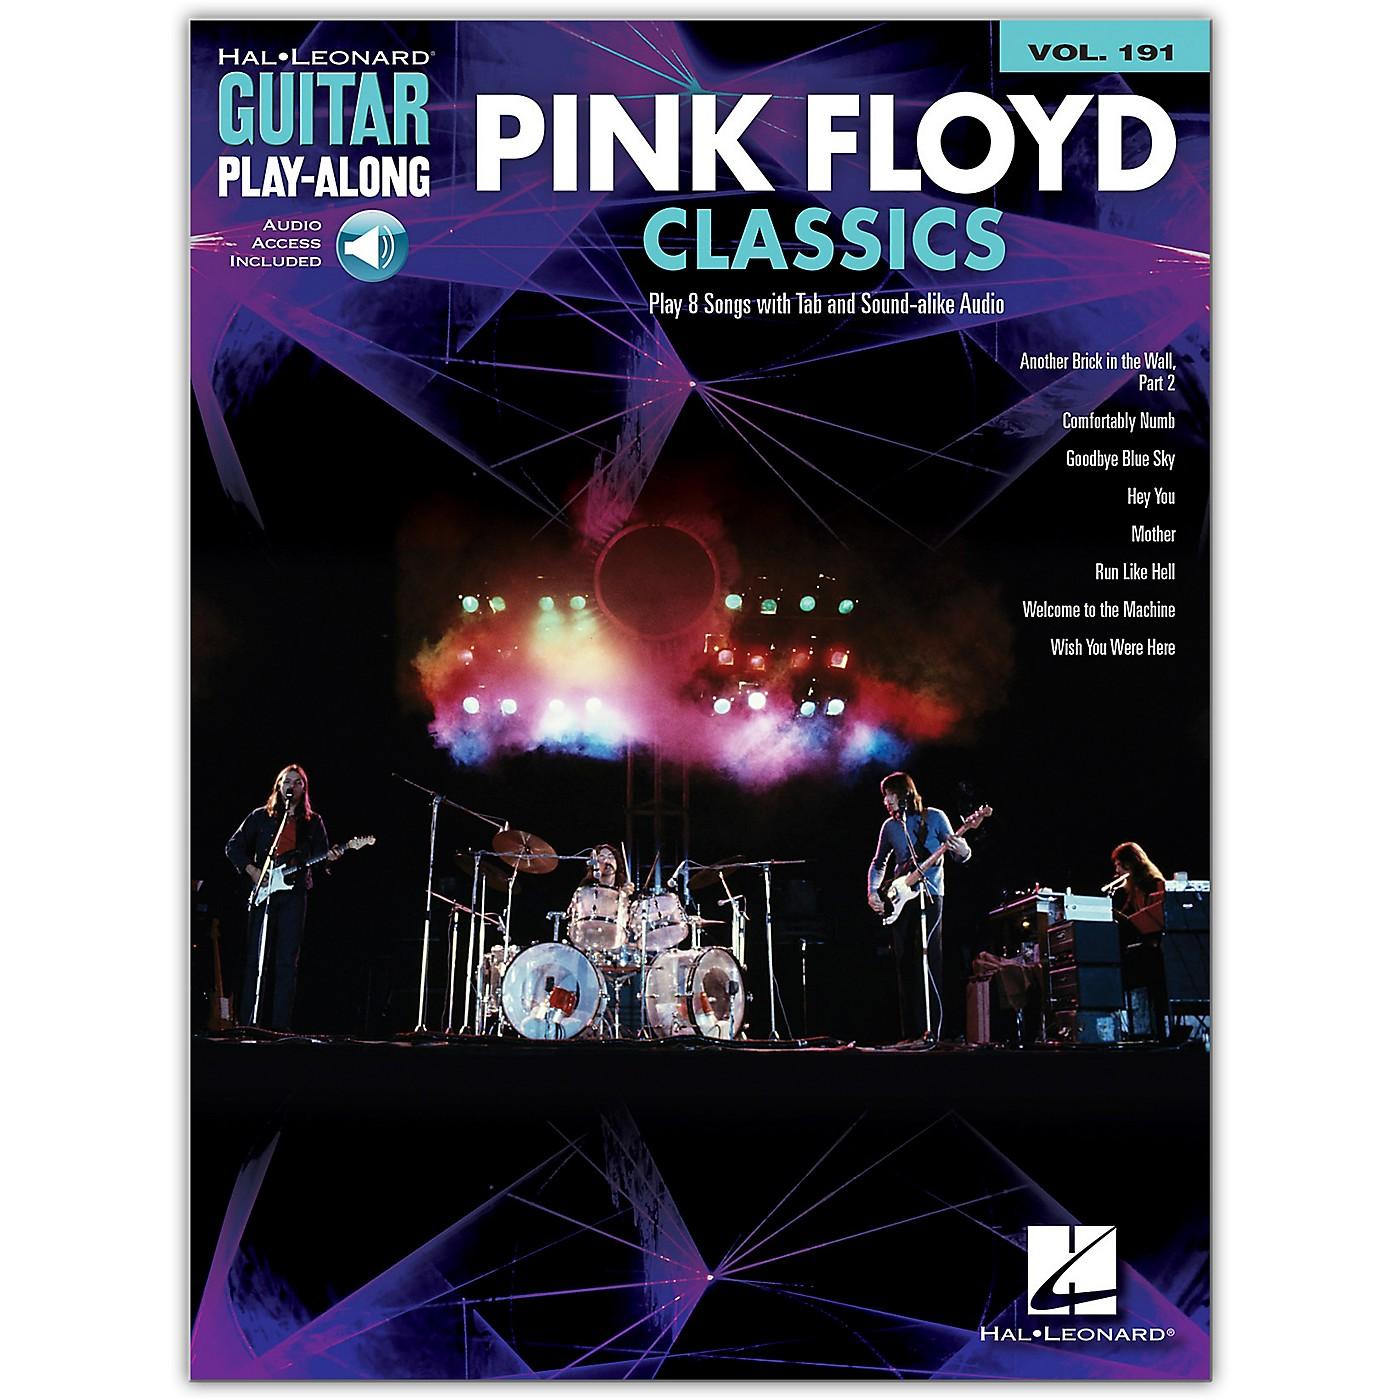 Hal Leonard Pink Floyd Classics Guitar Play-Along Volume 191 Book/Audio Online thumbnail